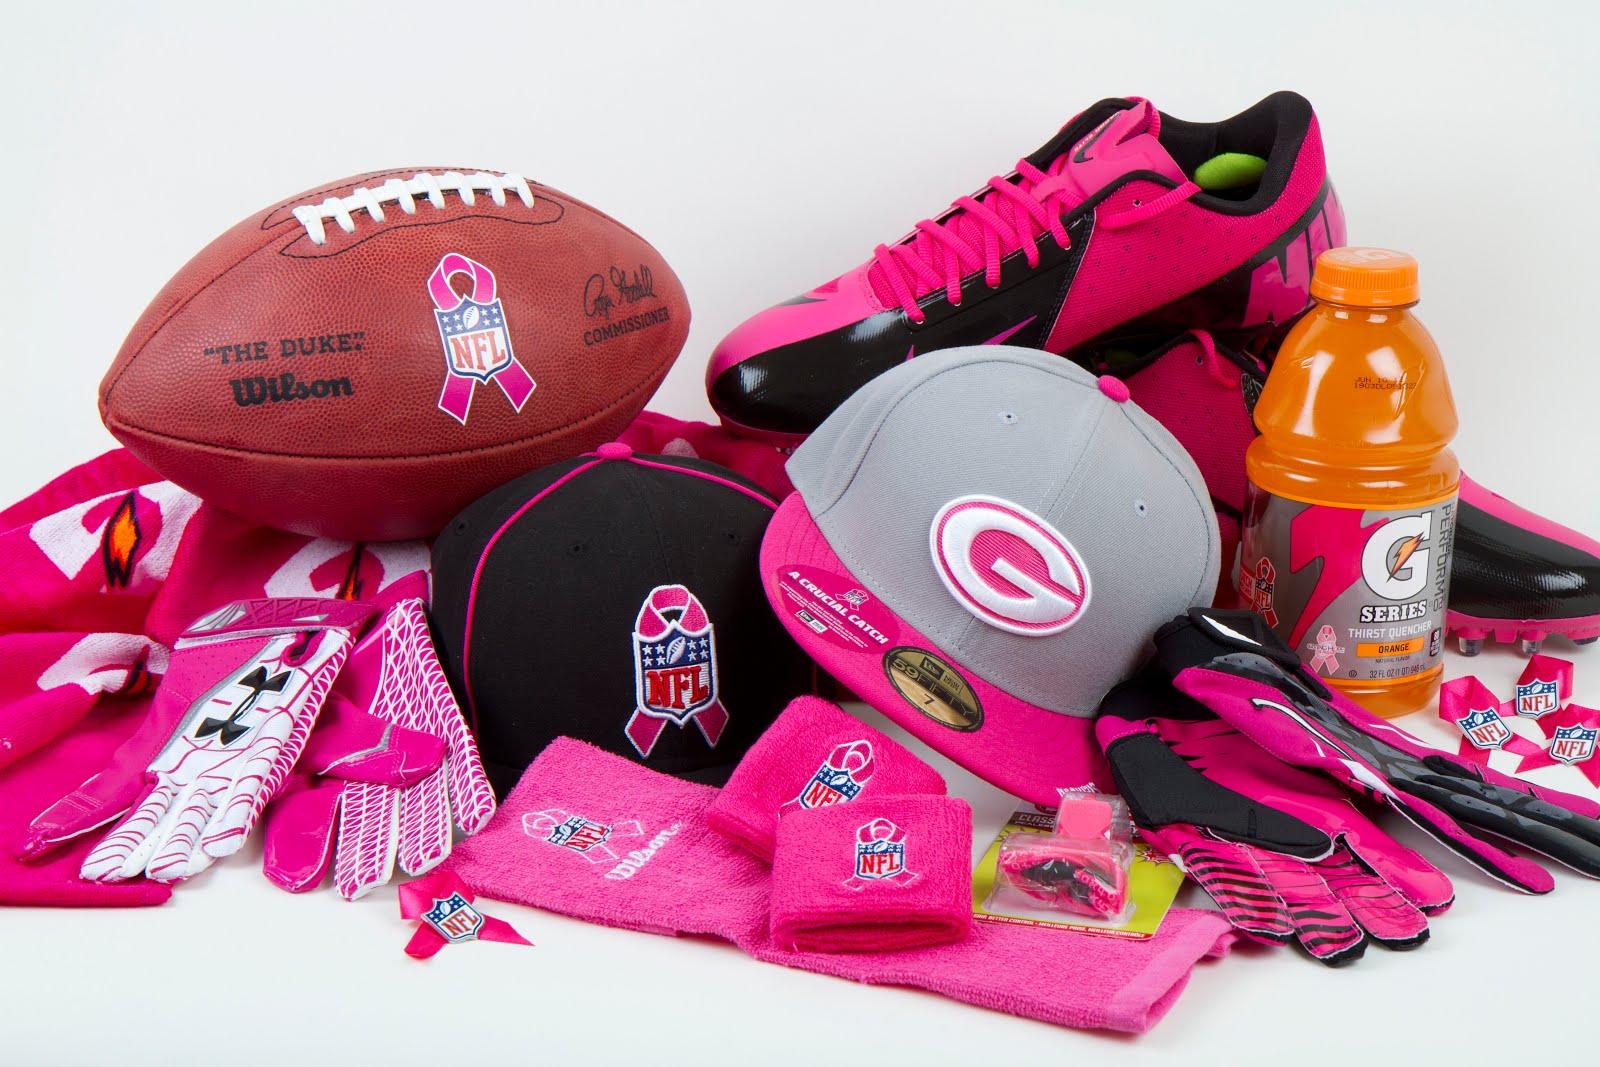 nfl breast cancer awareness gear jpg 853x1280